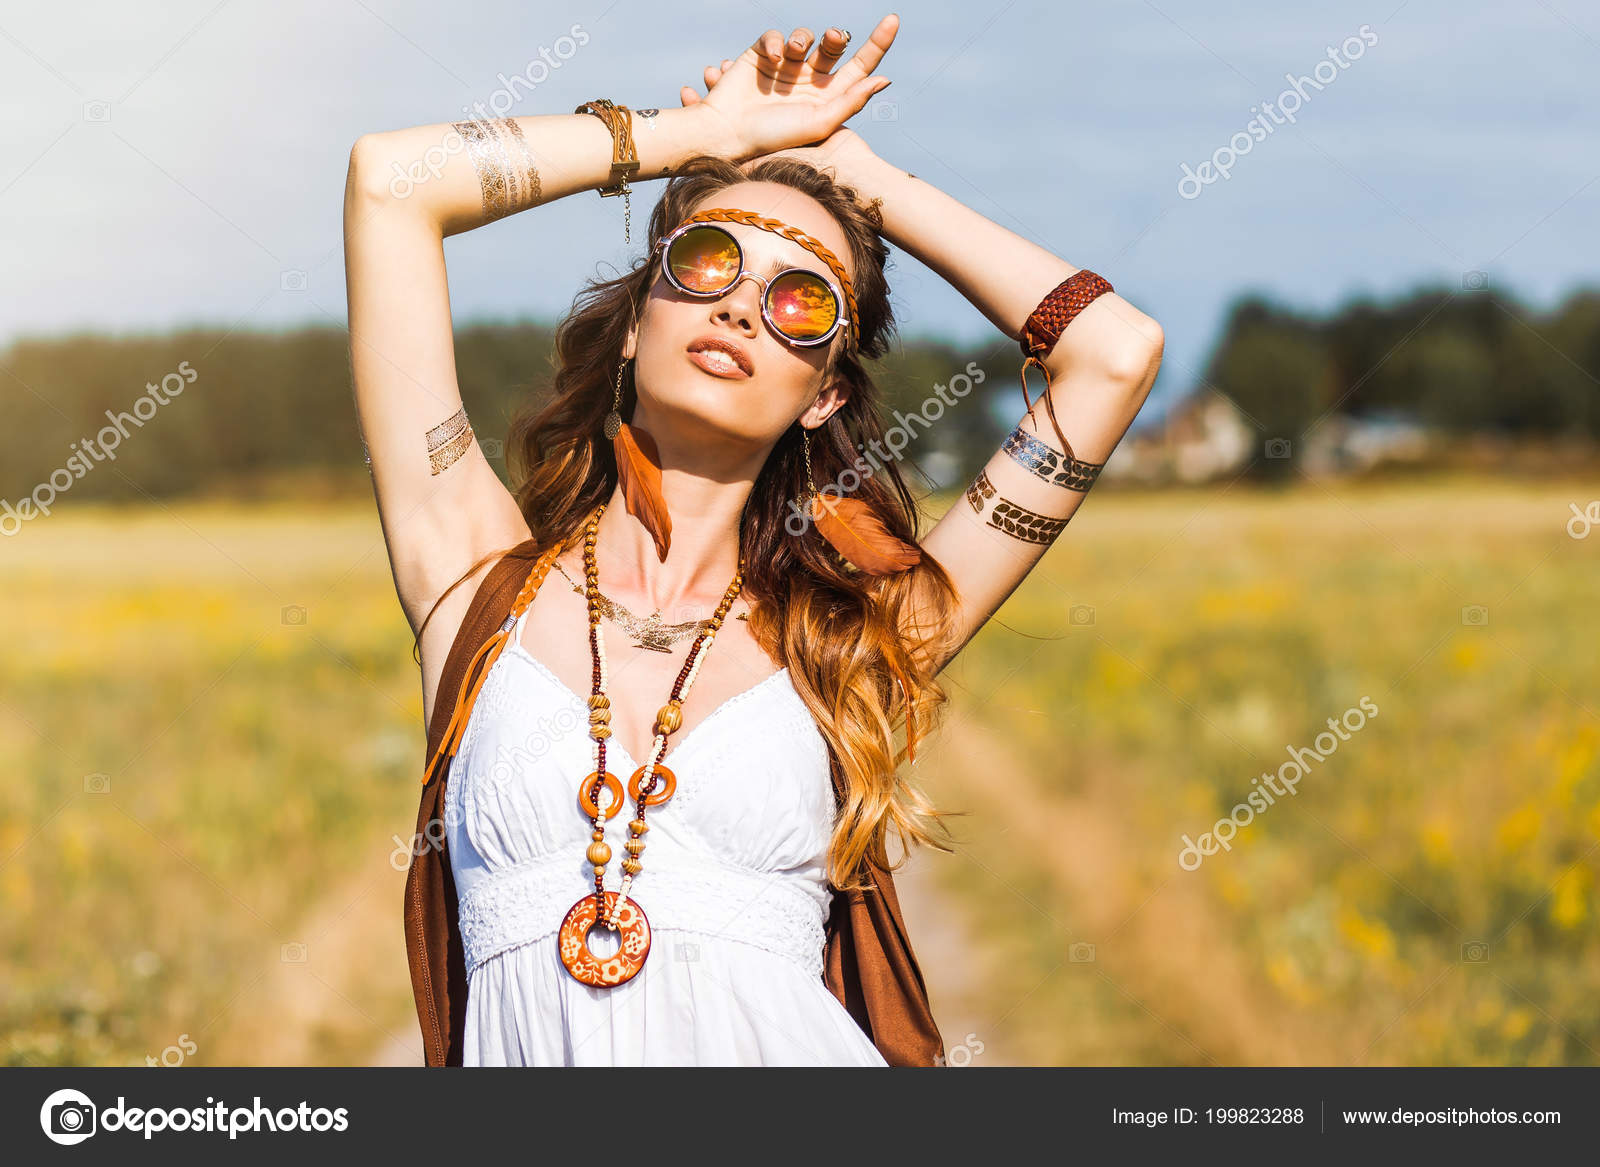 ᐈ Hippies girls stock photography, Royalty Free hippie girl photos | download on Depositphotos®